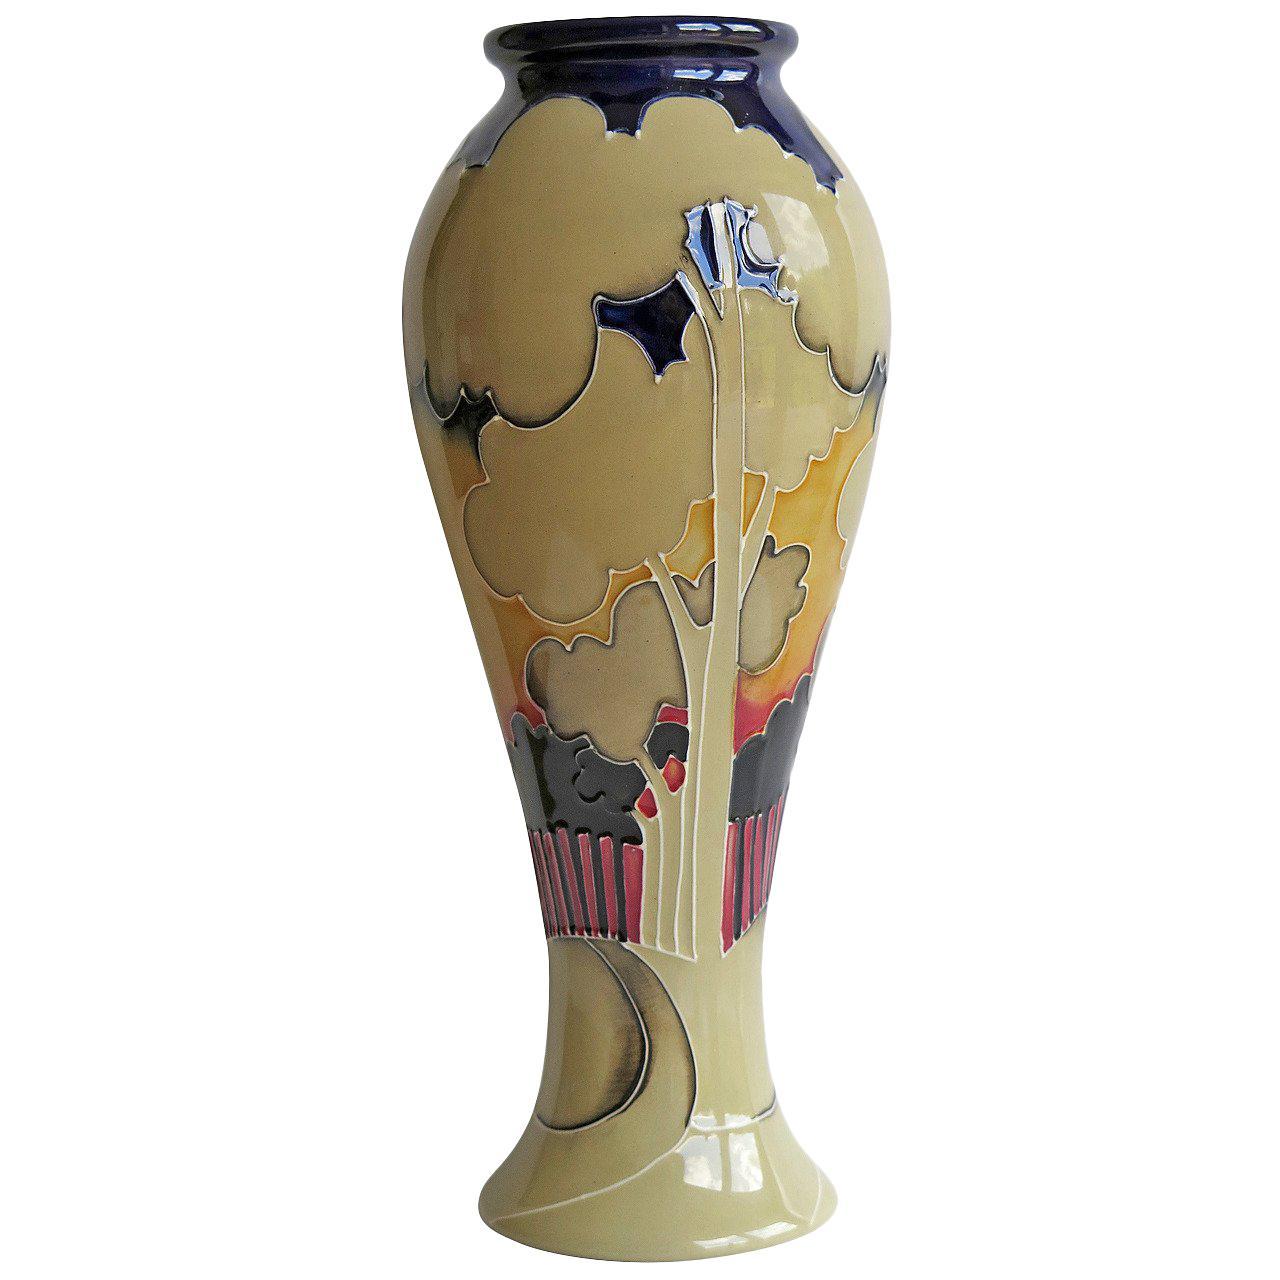 Moorcroft Pottery Vase by Vicky Lovatt Eventide Winter Limited Edition, 2013